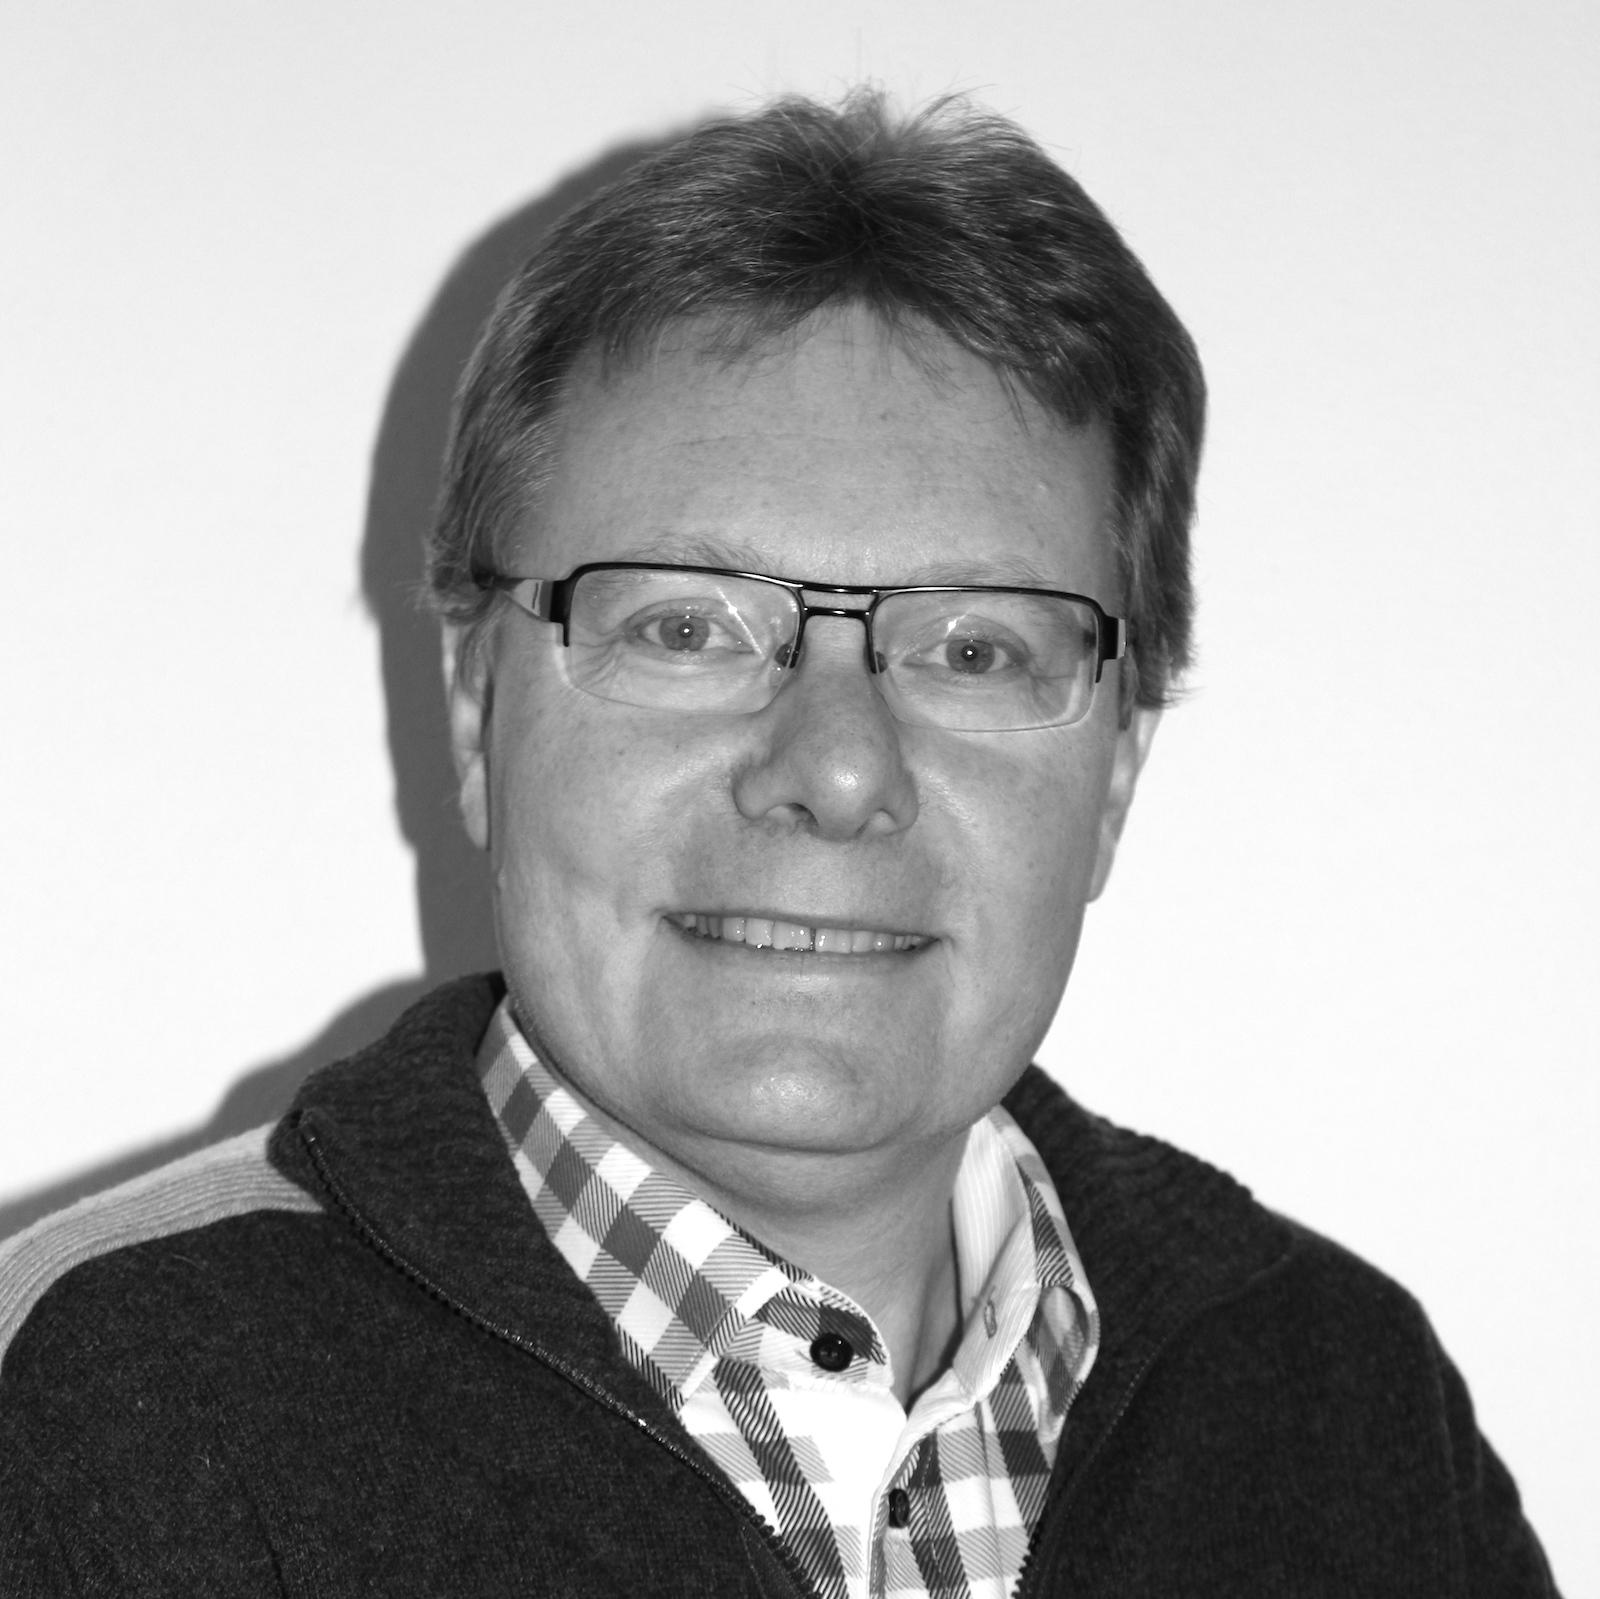 Jan Hestbæk